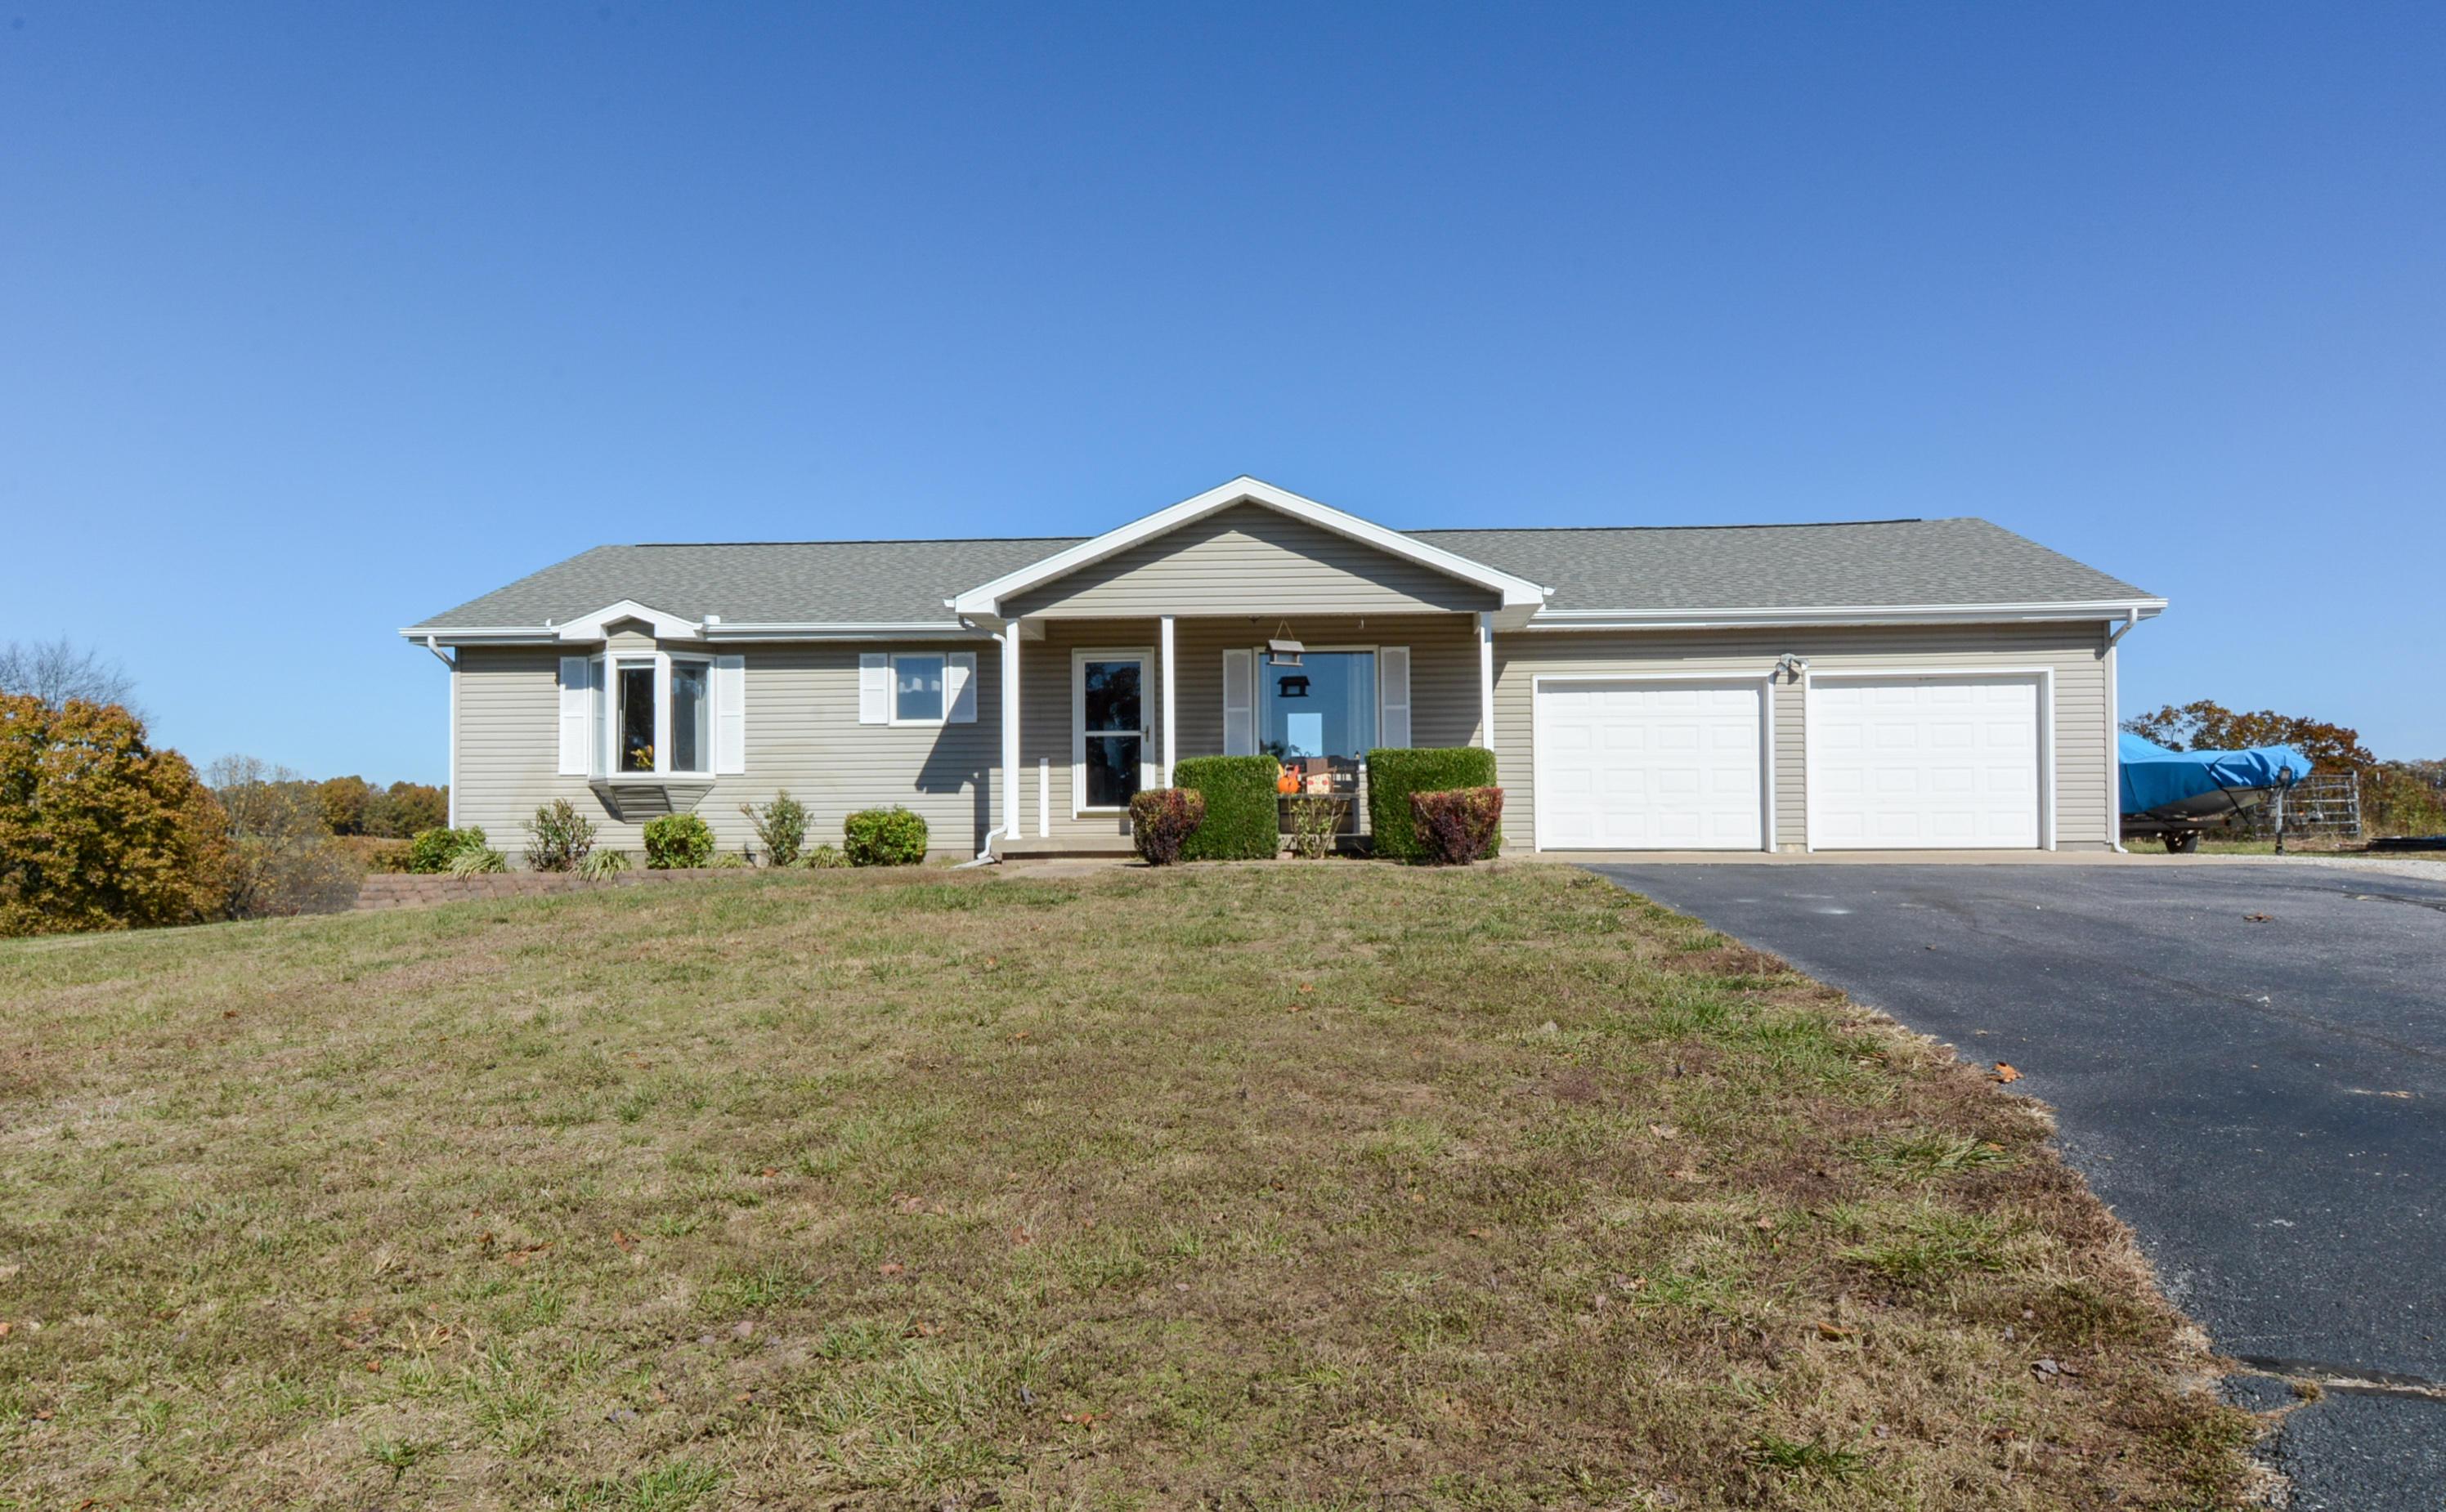 14930 Farm Road 2140 Cassville, MO 65625